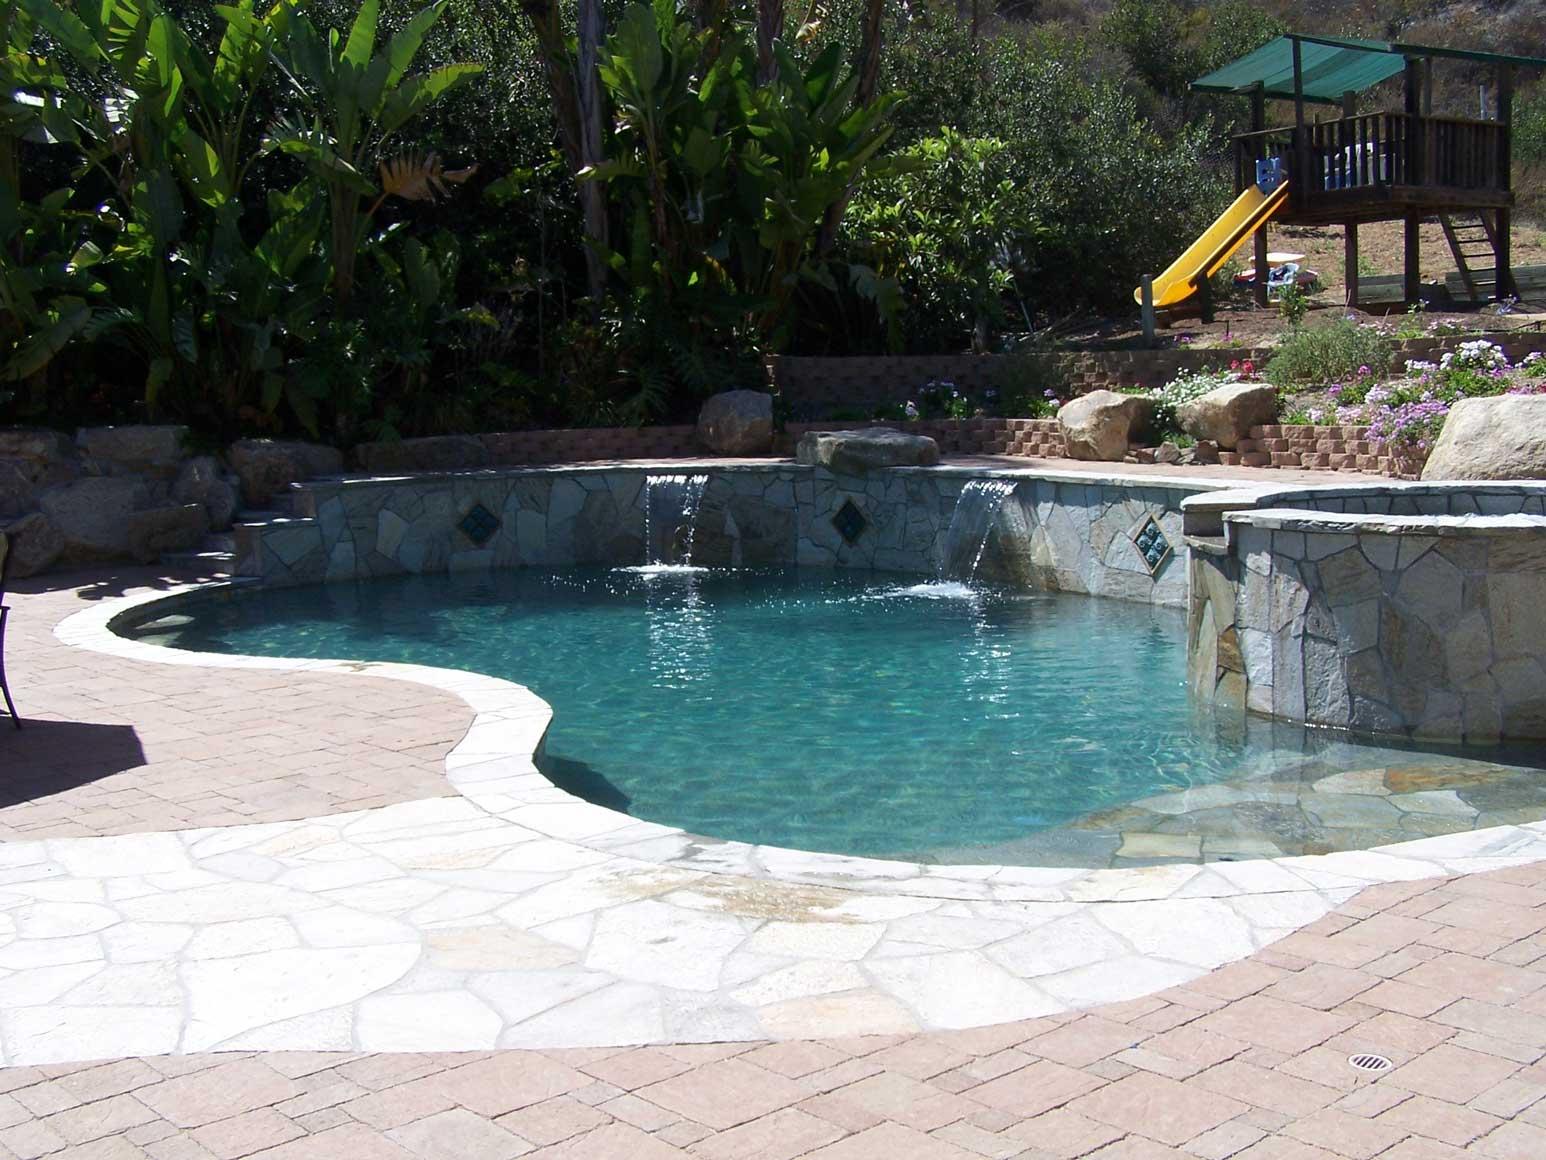 1 pool builders carlsbad ca swimming pool contractors - Swimming pool builders california ...